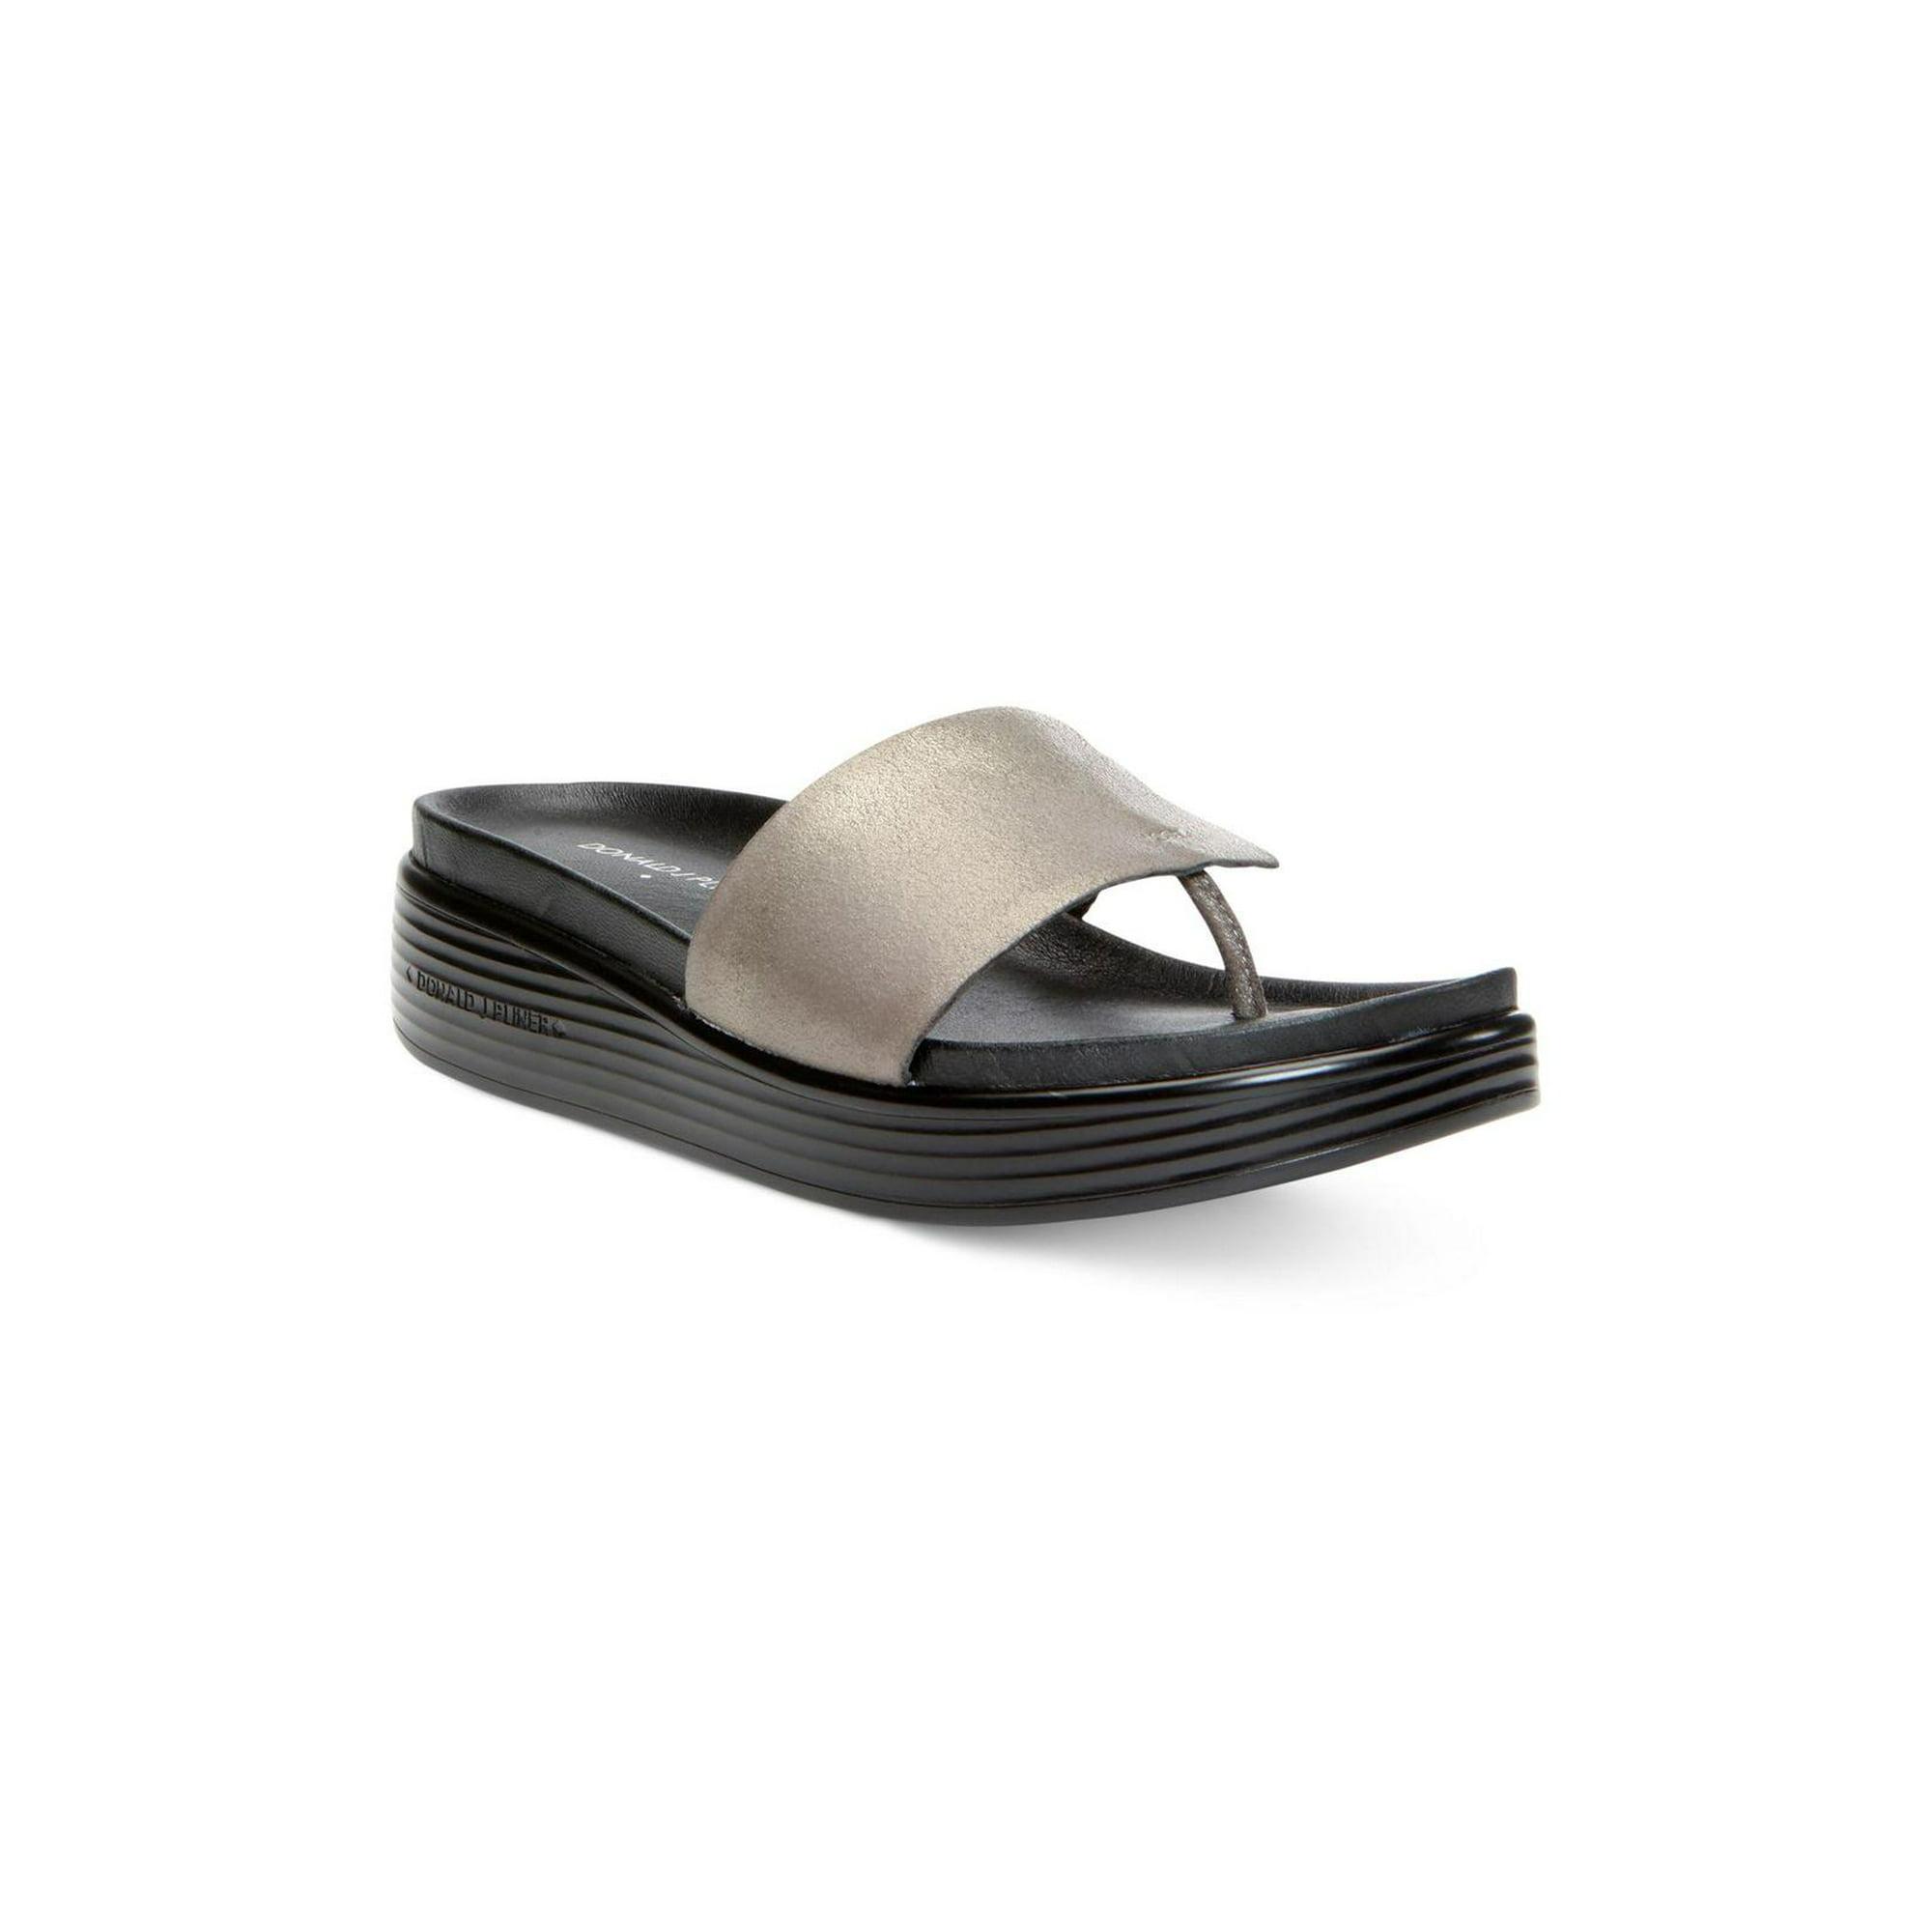 b623f430565 Donald J Pliner Womens FiFi Leather Open Toe Casual Platform ...